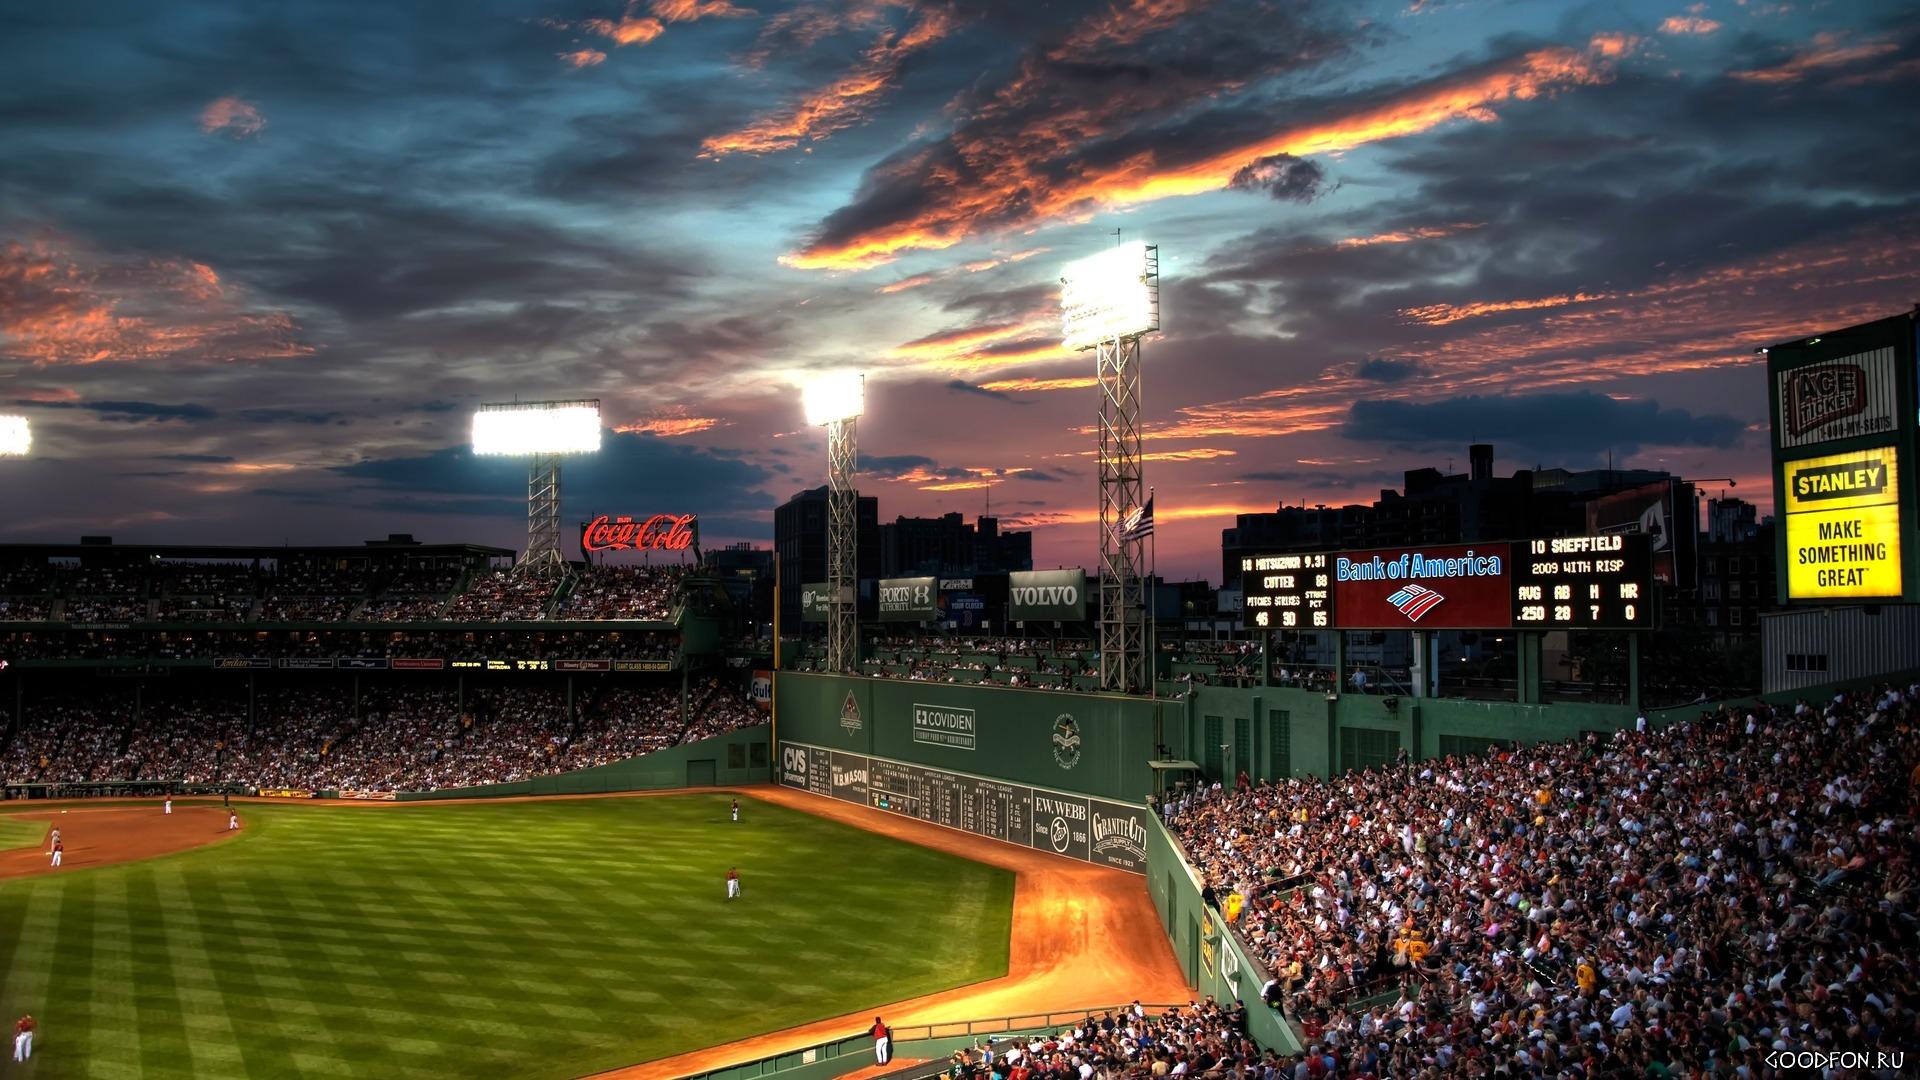 wwwfreecodesourcecomwallpaperswallpaperStadium For Baseball 1920x1080